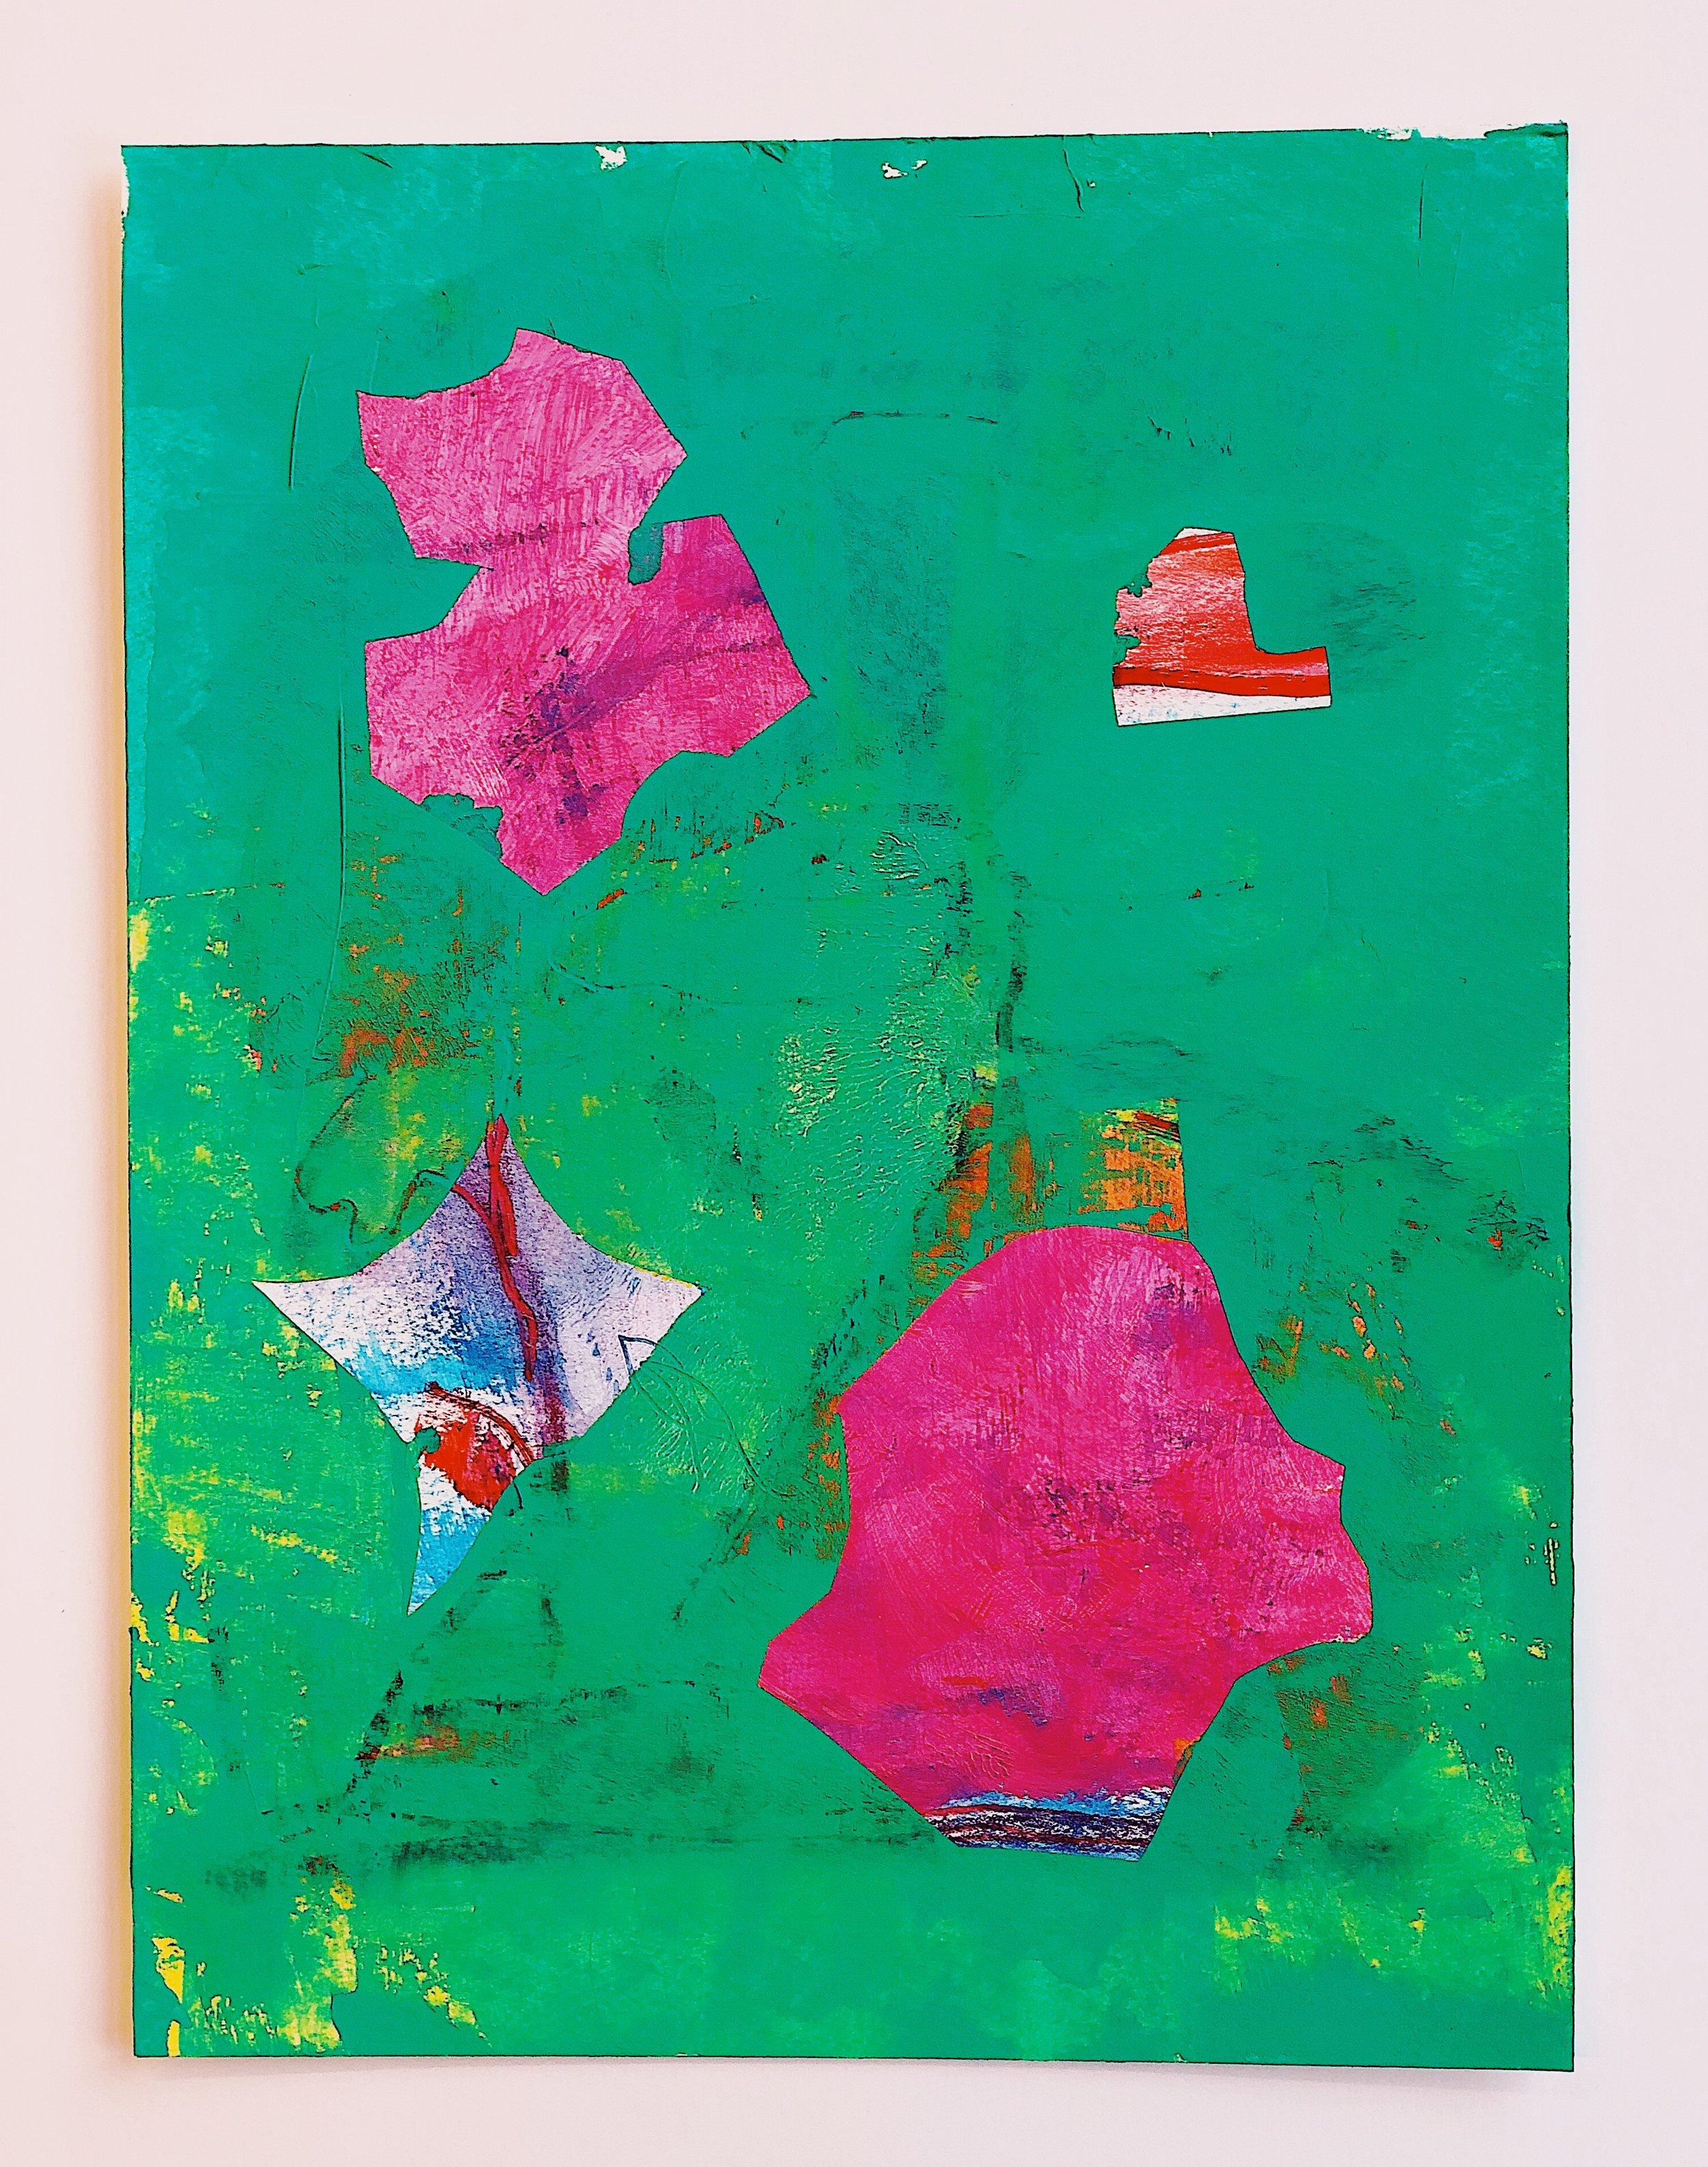 Lethean Pink and Green Pleasure Voyage  (2016)